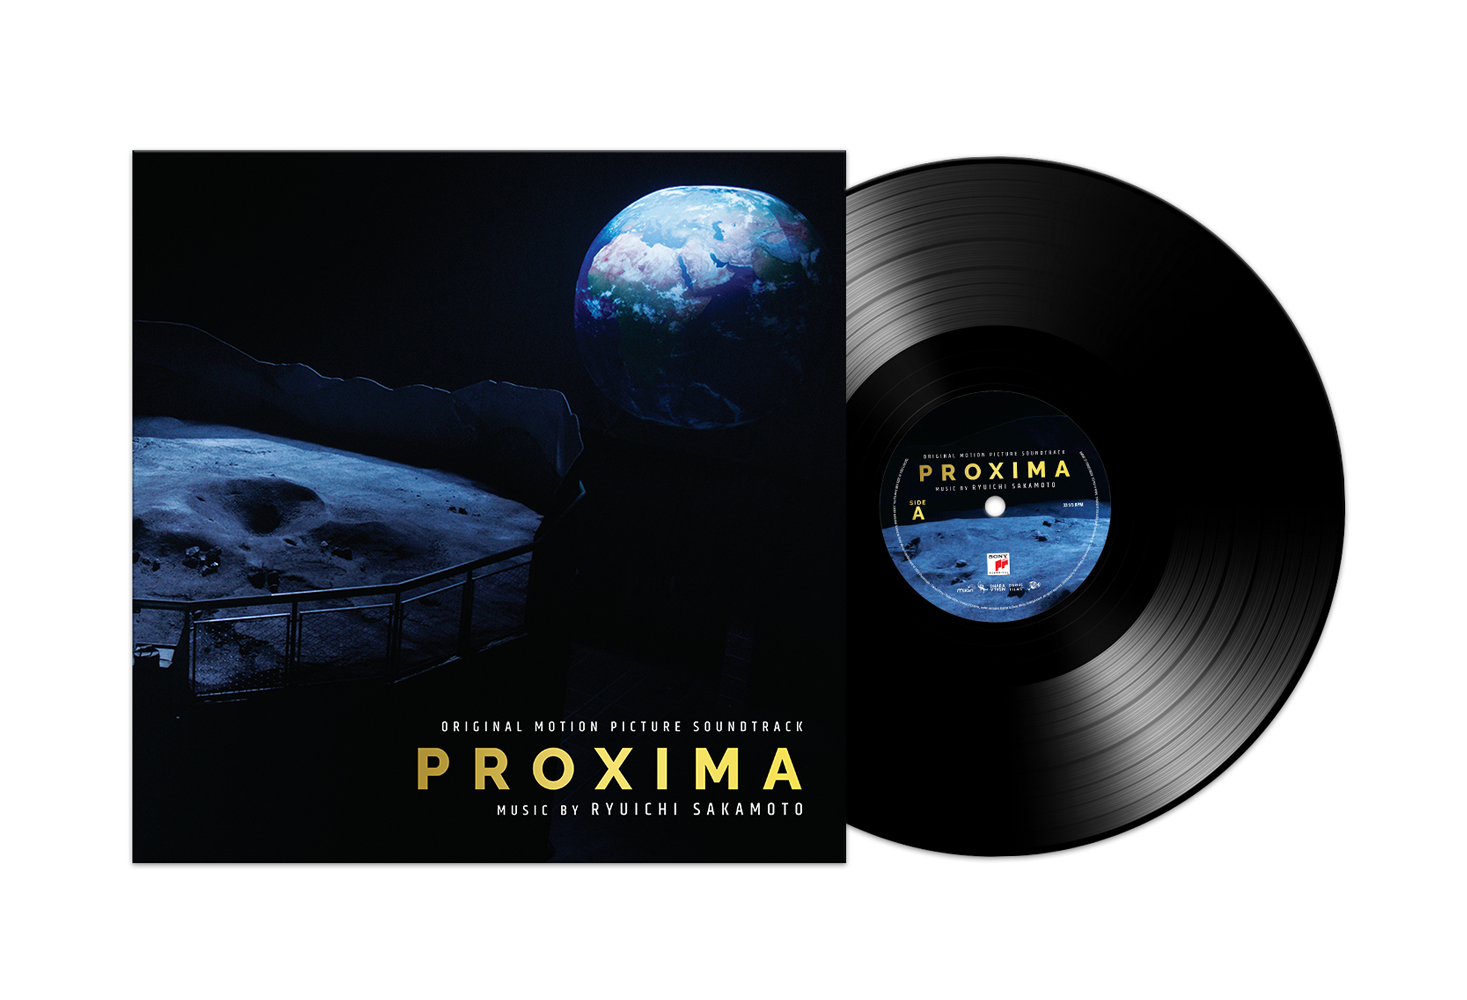 Proxima_LP_Packshot_Cover-Vinyl